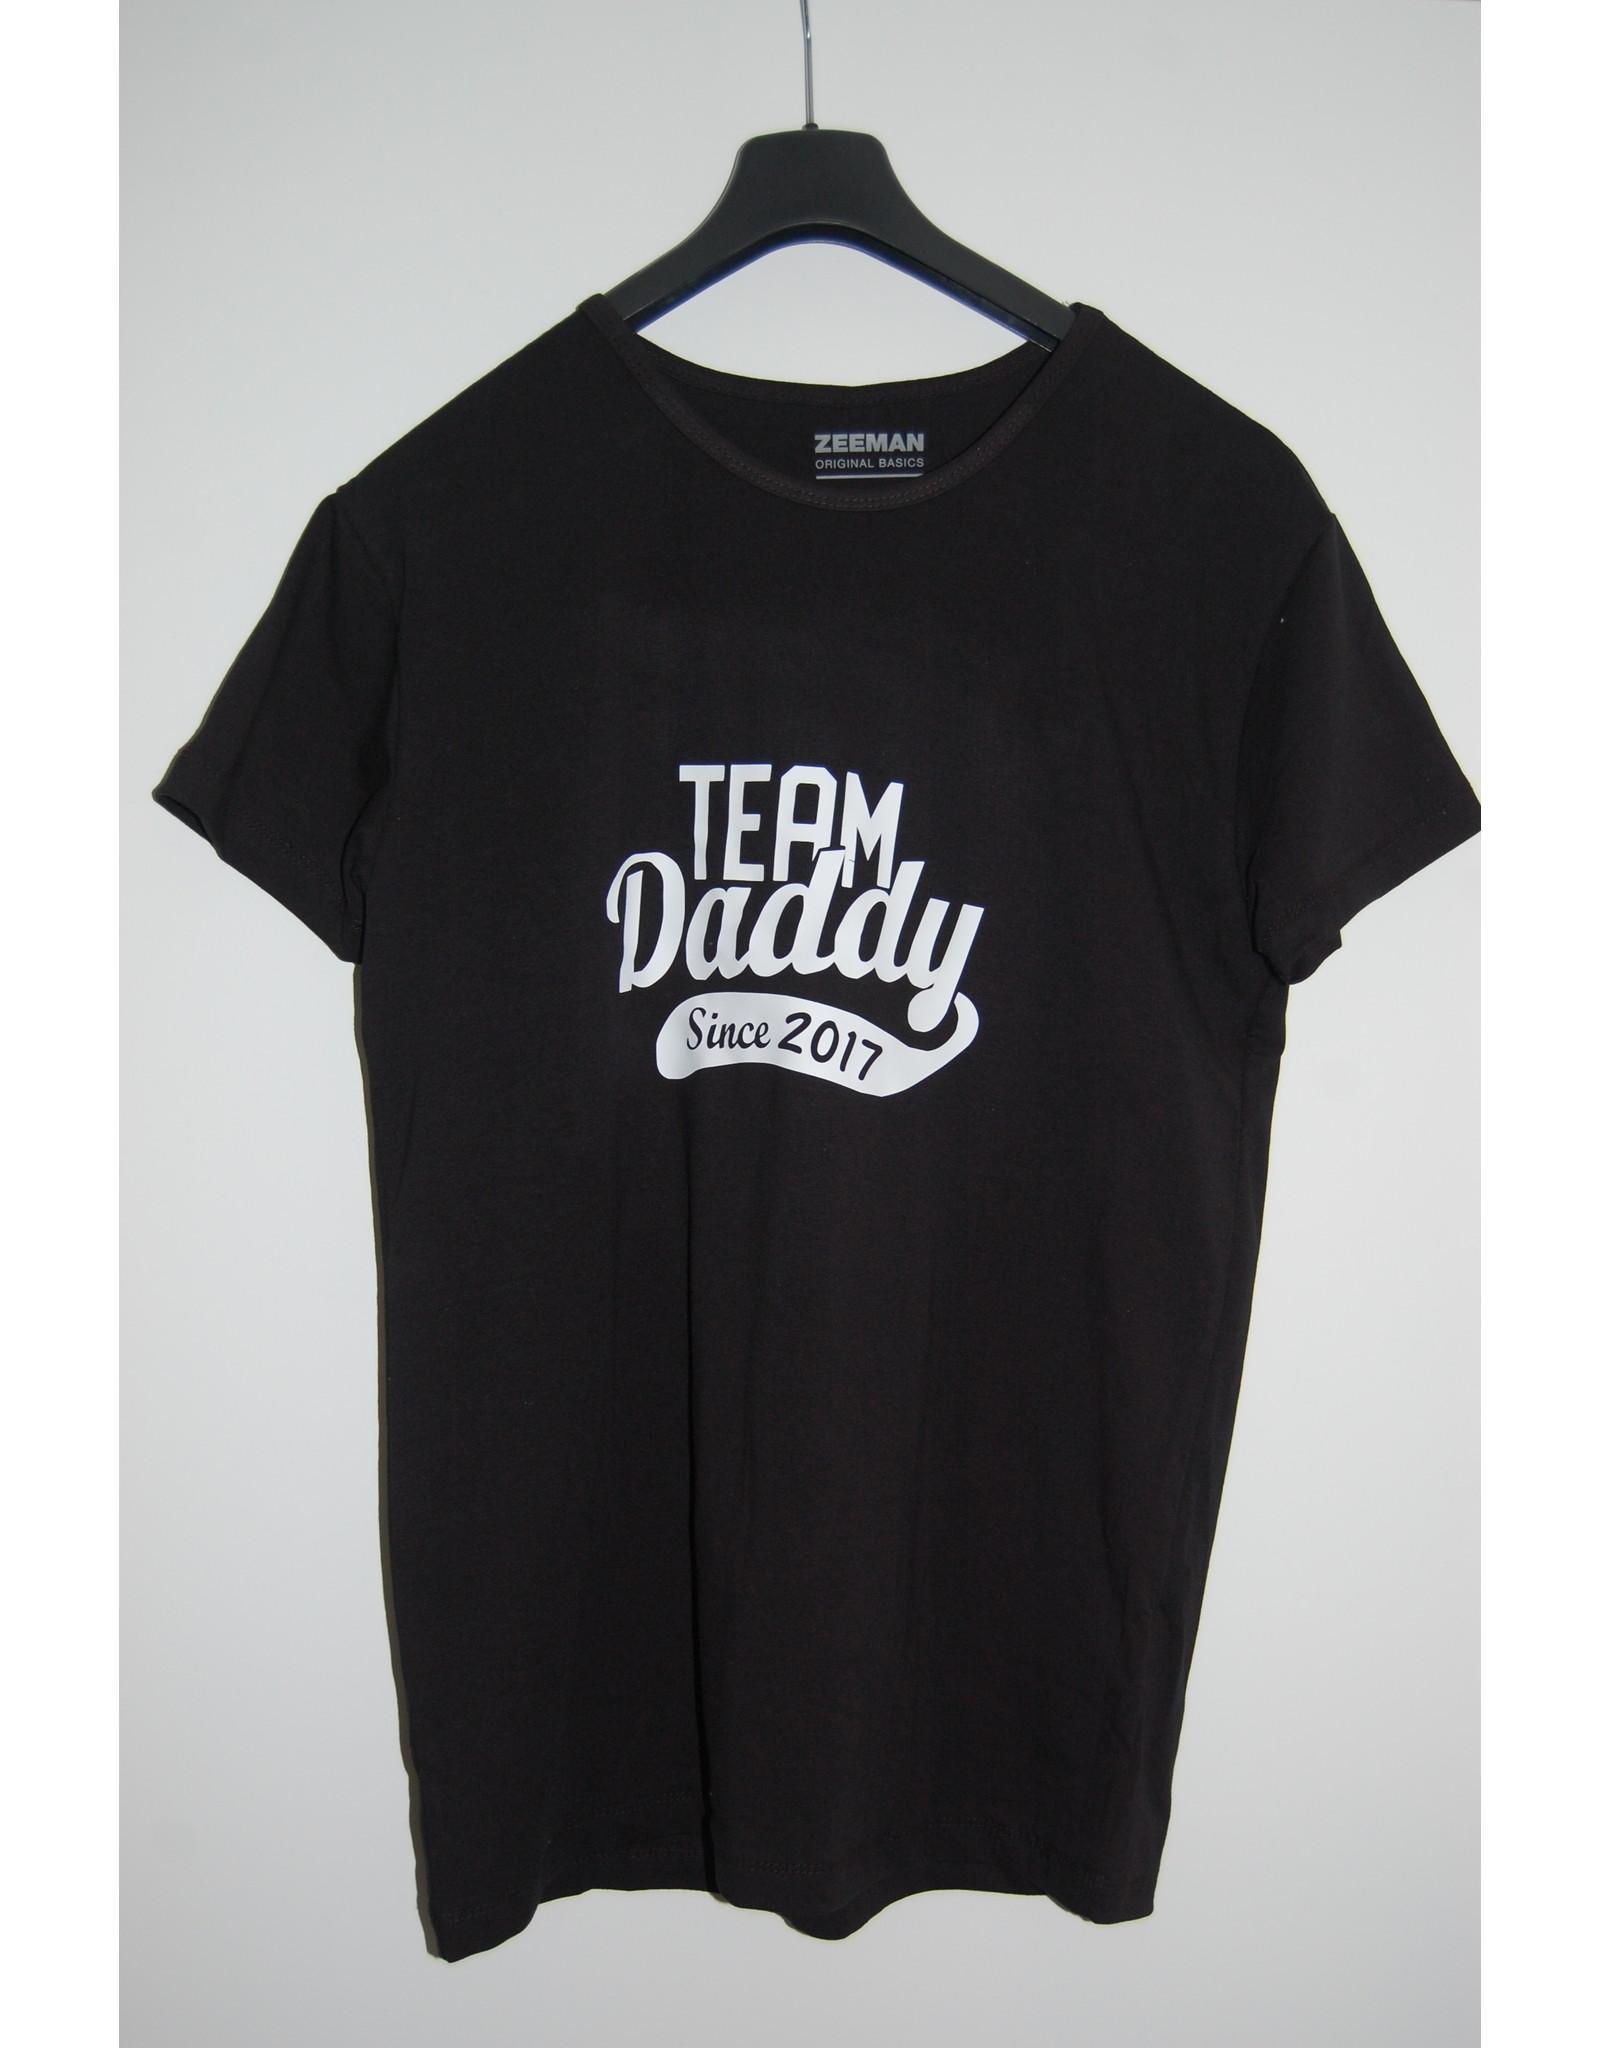 Eigen T-Shirts bedrukken